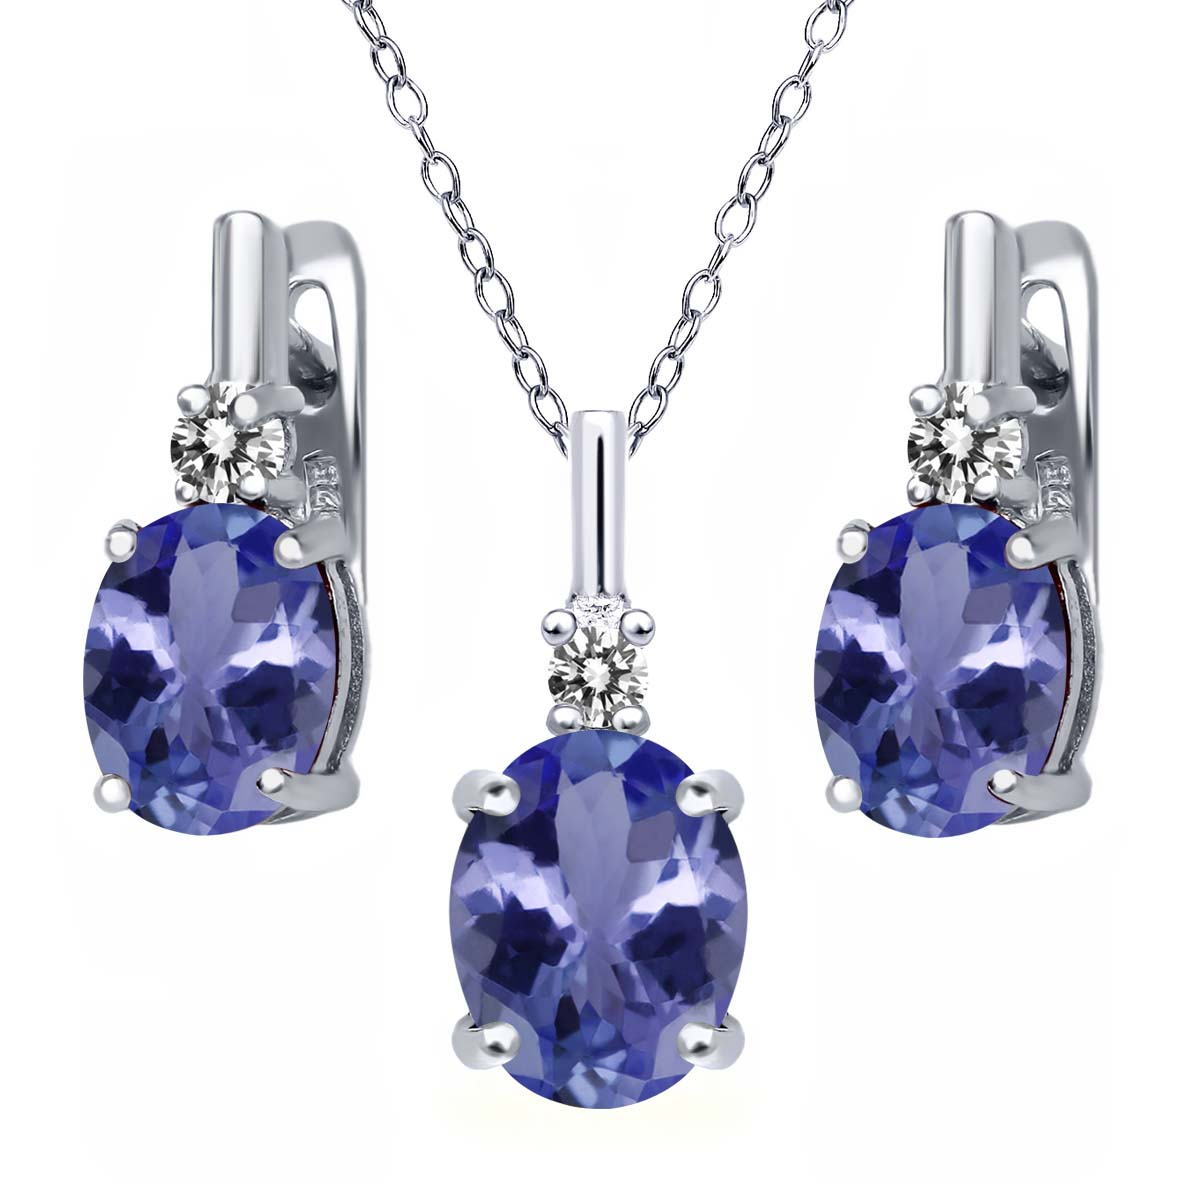 5.17 Ct Blue Tanzanite AAAA White Diamond 925 Silver Pendant Earrings Set by